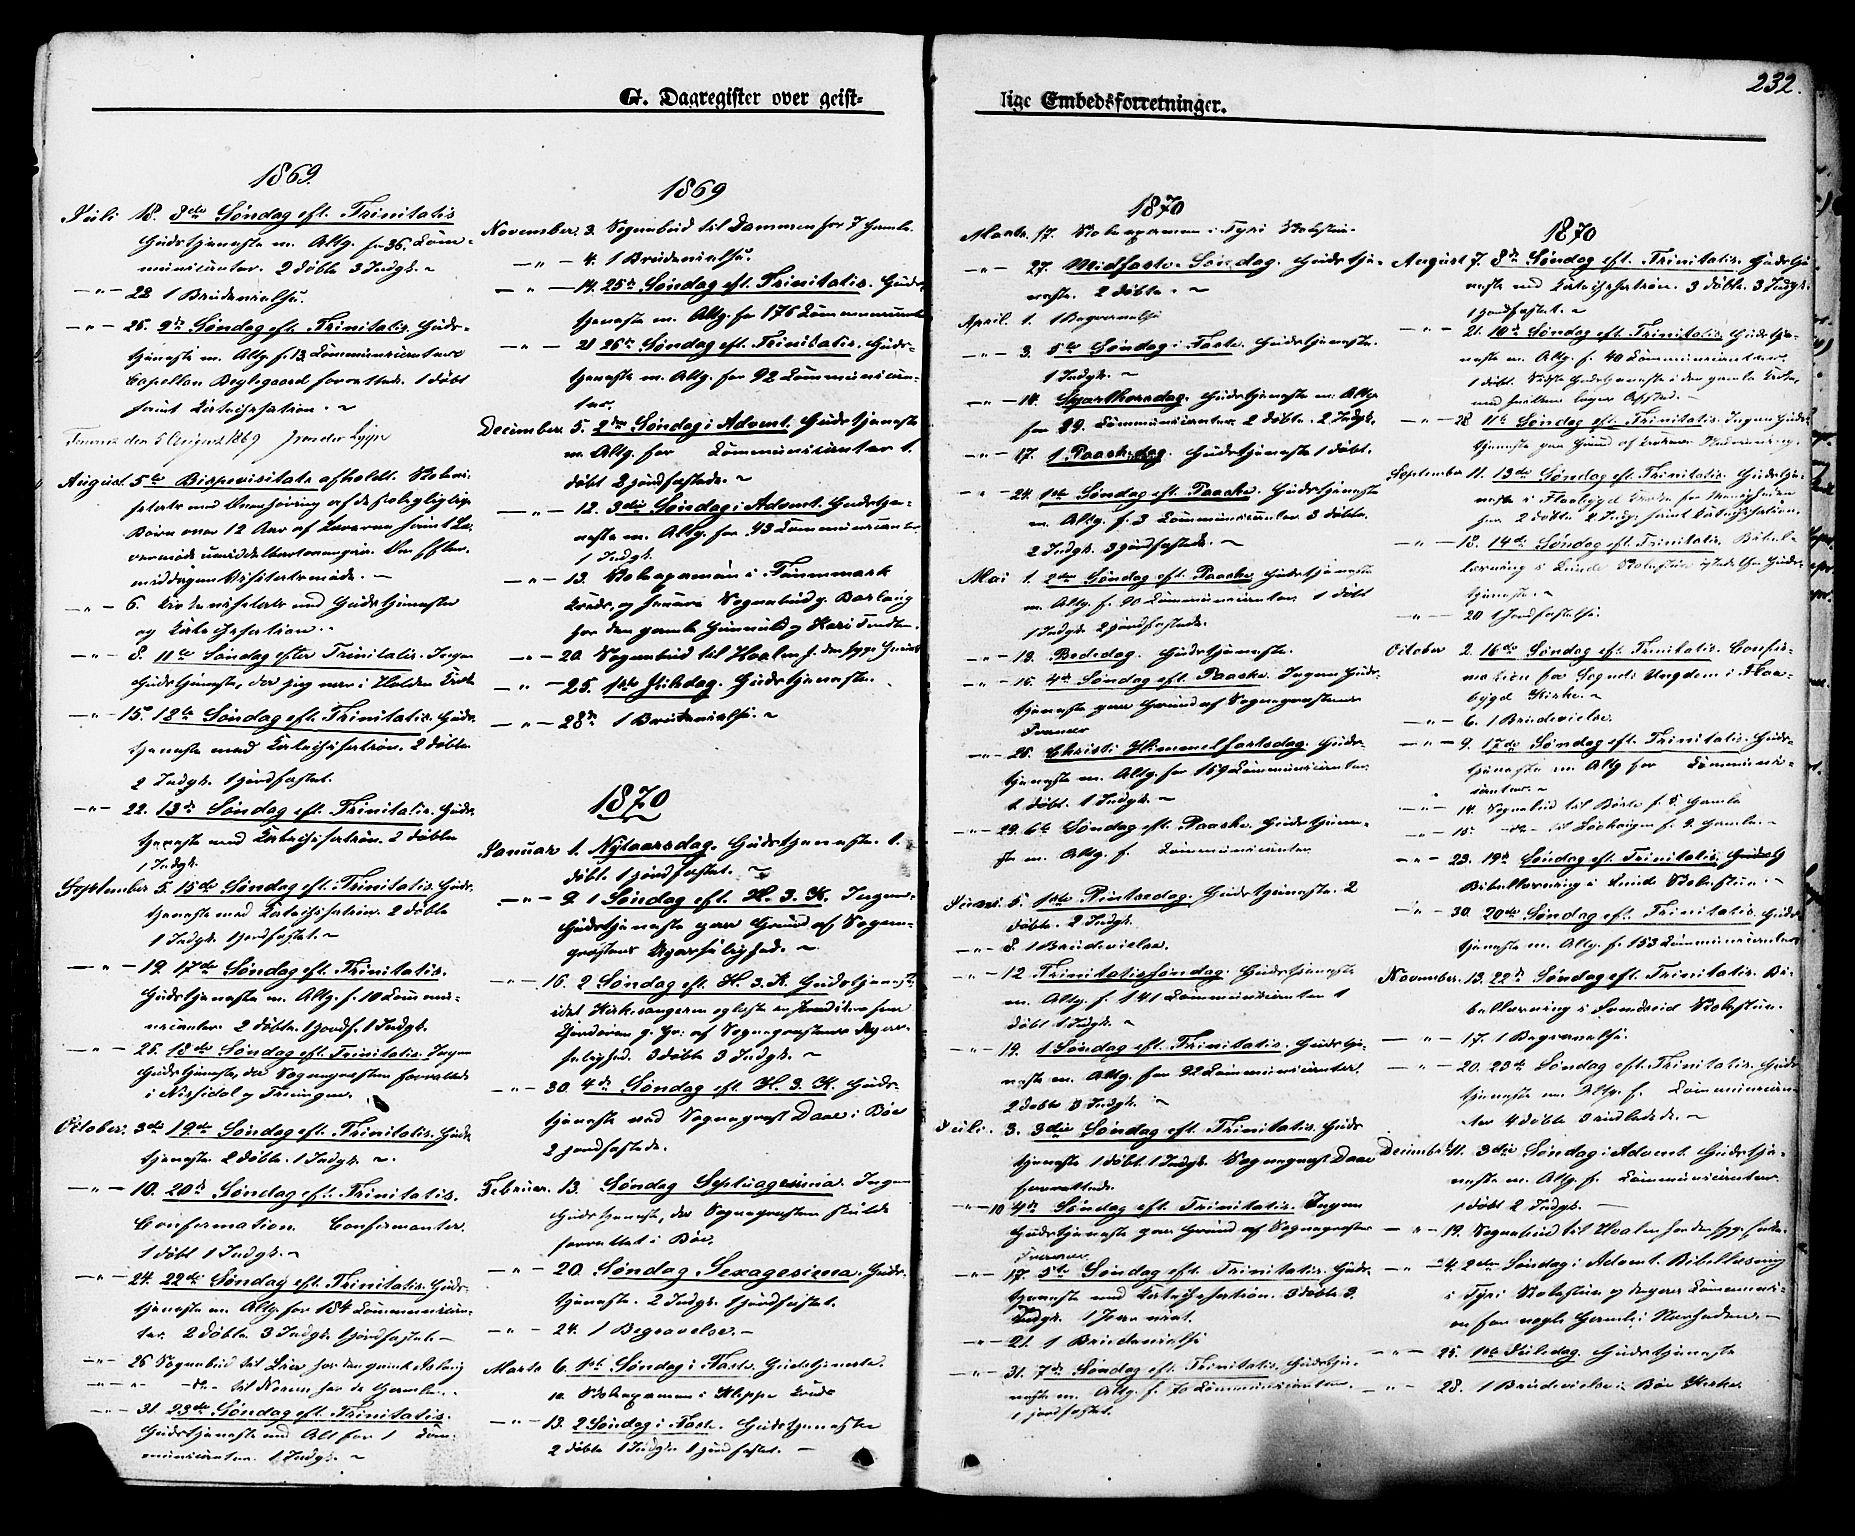 SAKO, Lunde kirkebøker, F/Fa/L0001: Ministerialbok nr. I 1, 1866-1883, s. 232